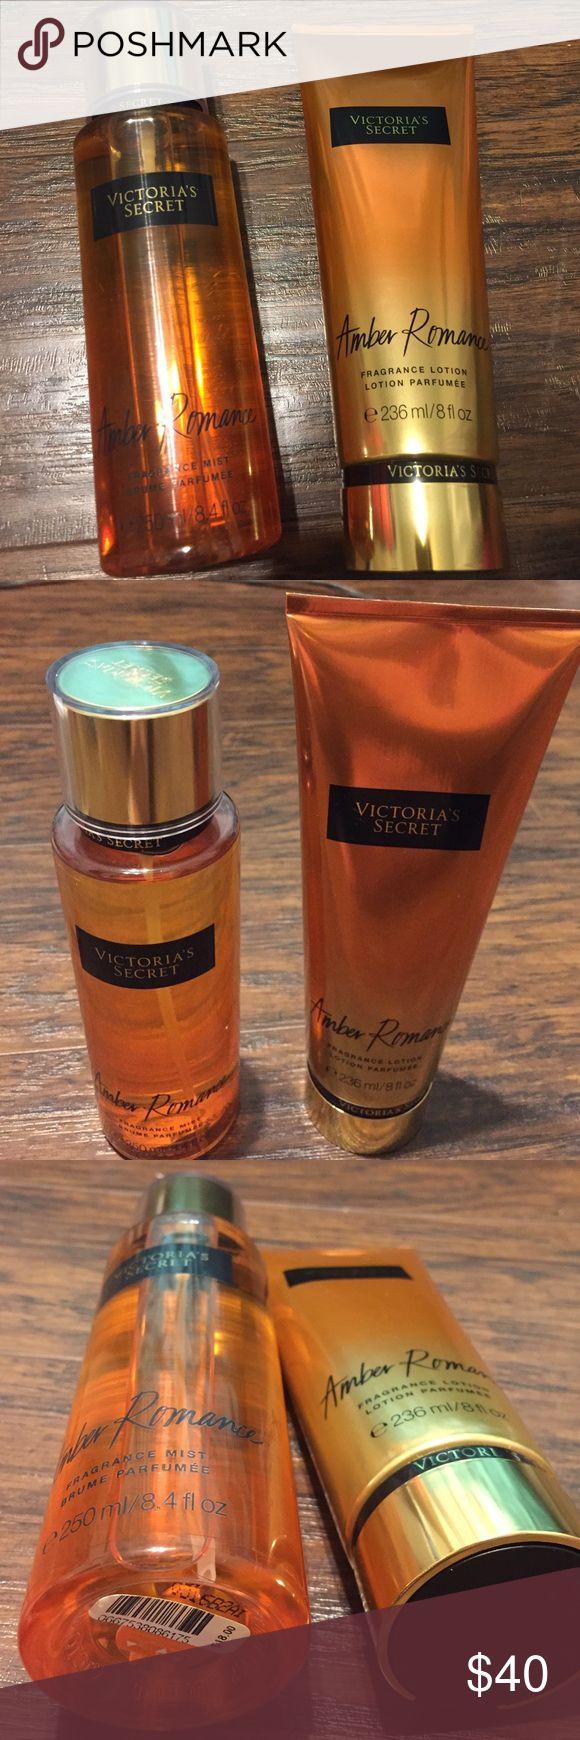 "Victoria Secret body mist & lotion set Victoria's Secret fragrance spray body mist (8.4 fl oz.)& body lotion (8 fl. Oz) set ""Amber Romance"", brand new Victoria's Secret Other"